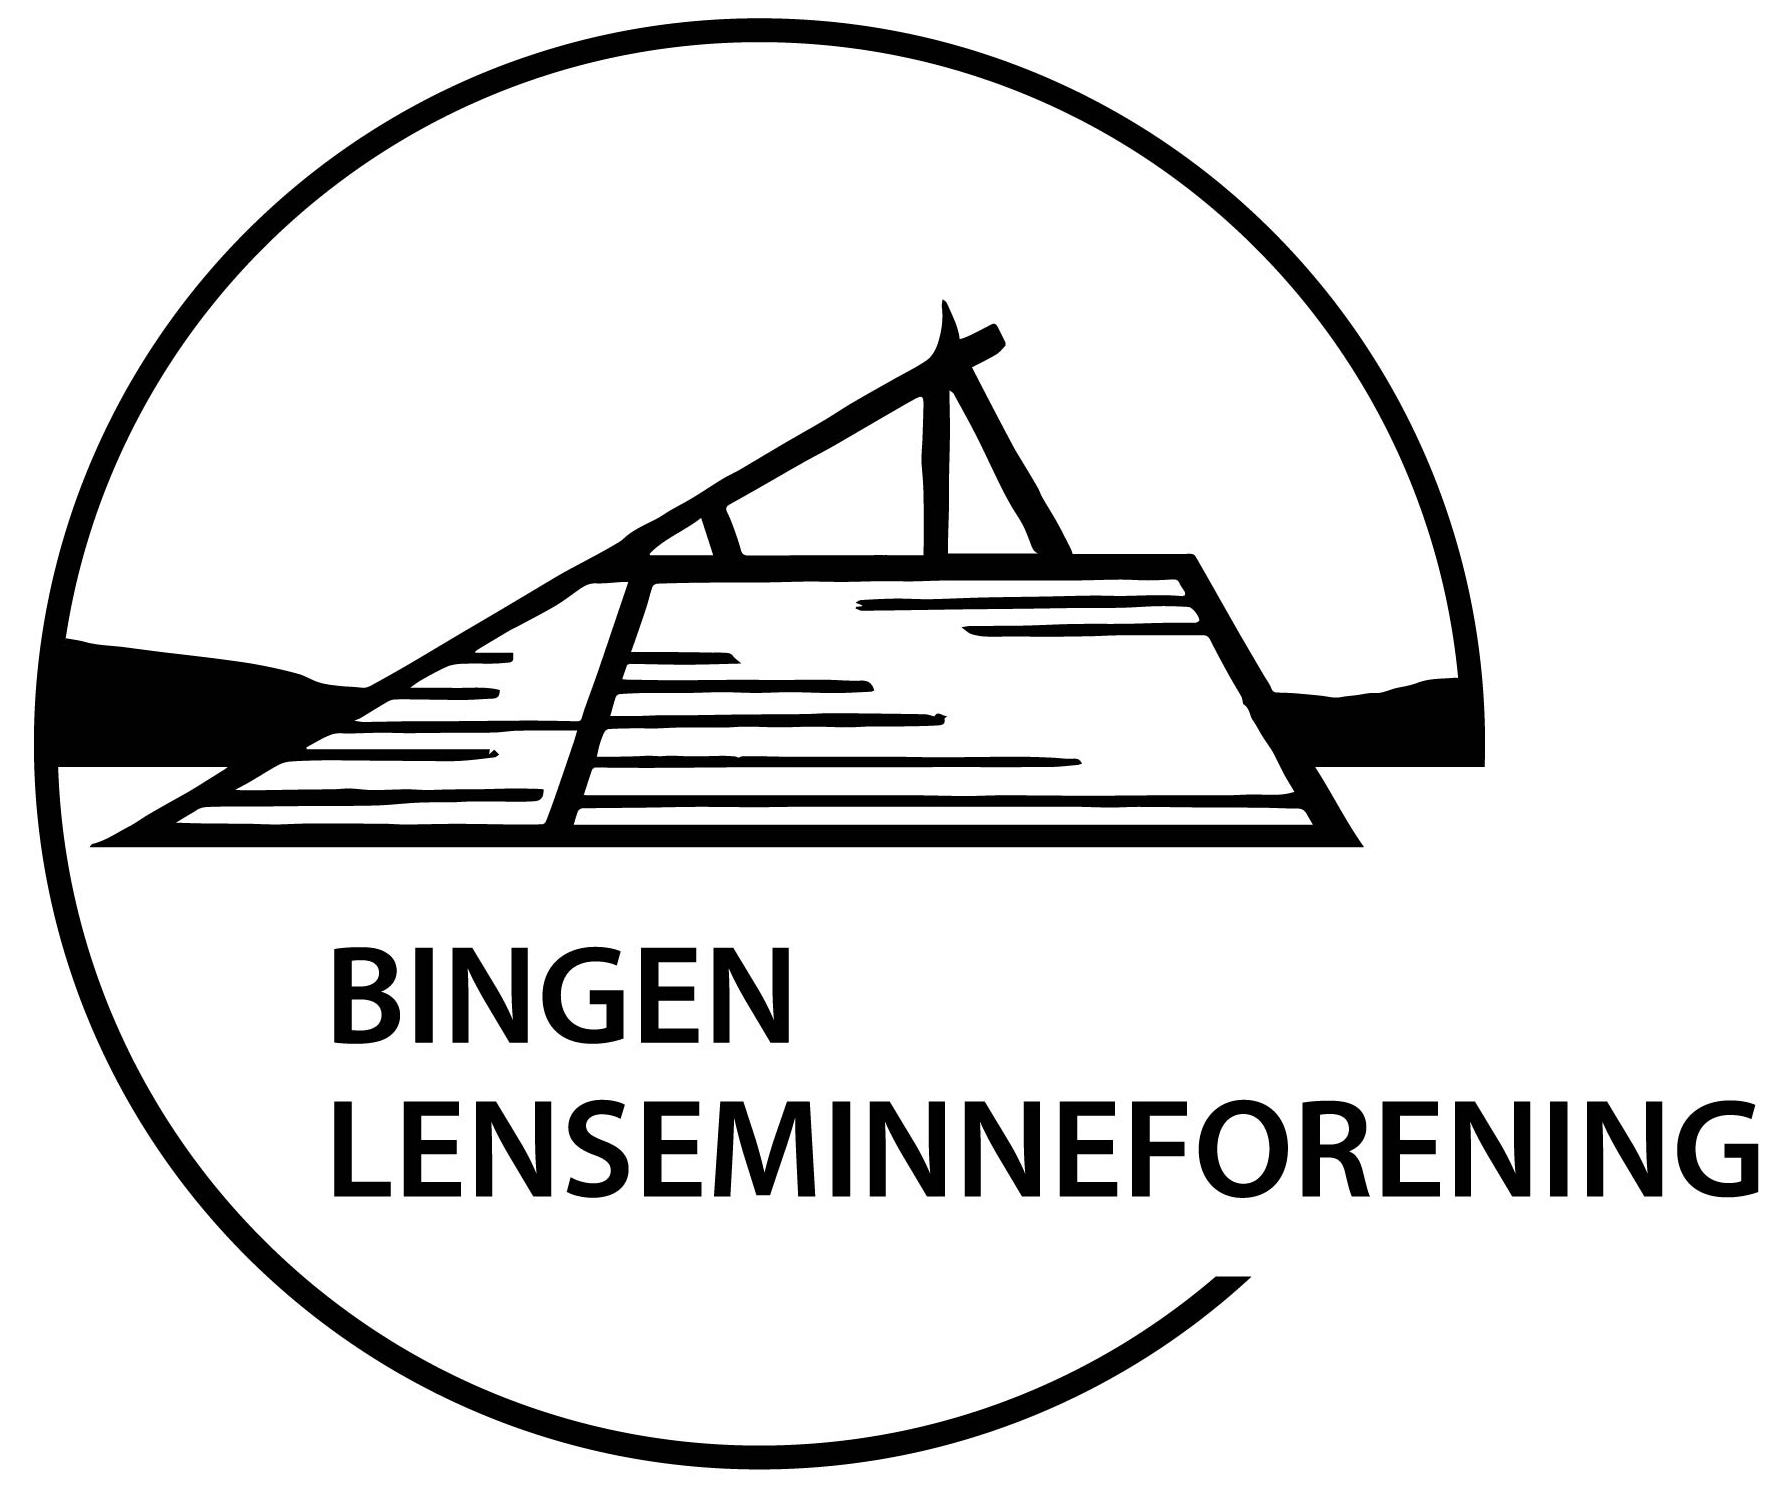 Bingen Lenseminneforening